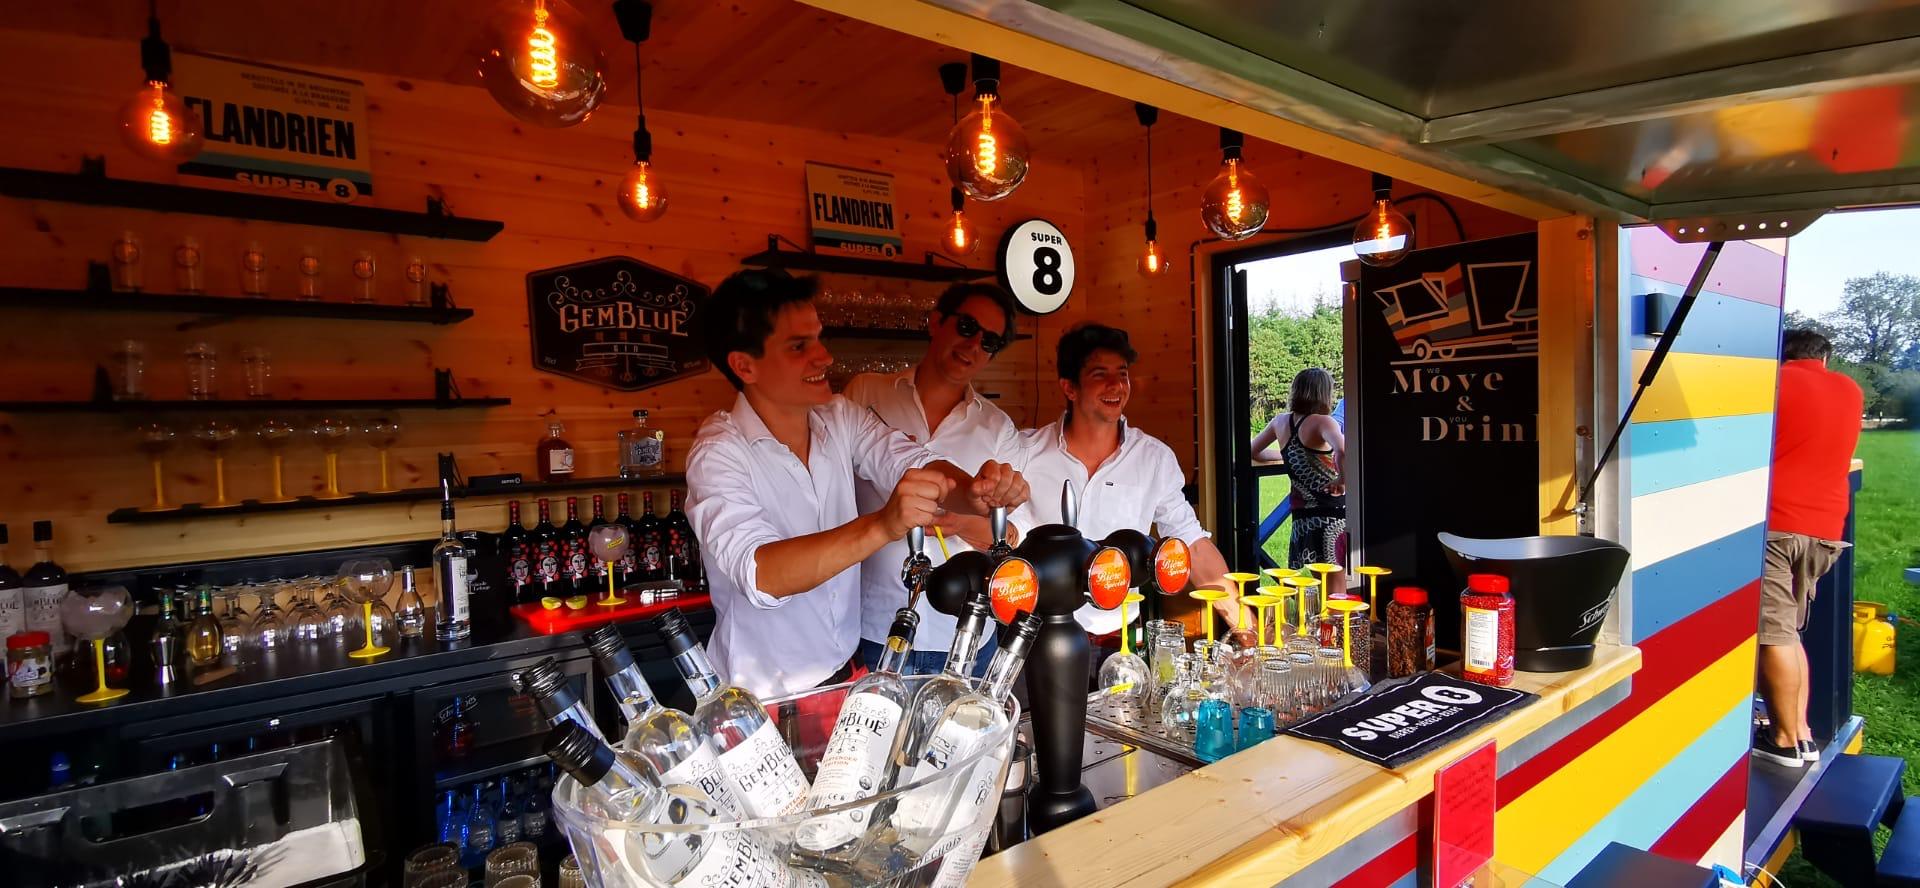 move and drink - bar - itinérant - foodtruck - truck - tiny - tinyhouse - tinyhome - homebar - party - tinybar - event - sur mesure - horeca - professionnel - boisson - cocktail - cocktails - expérience